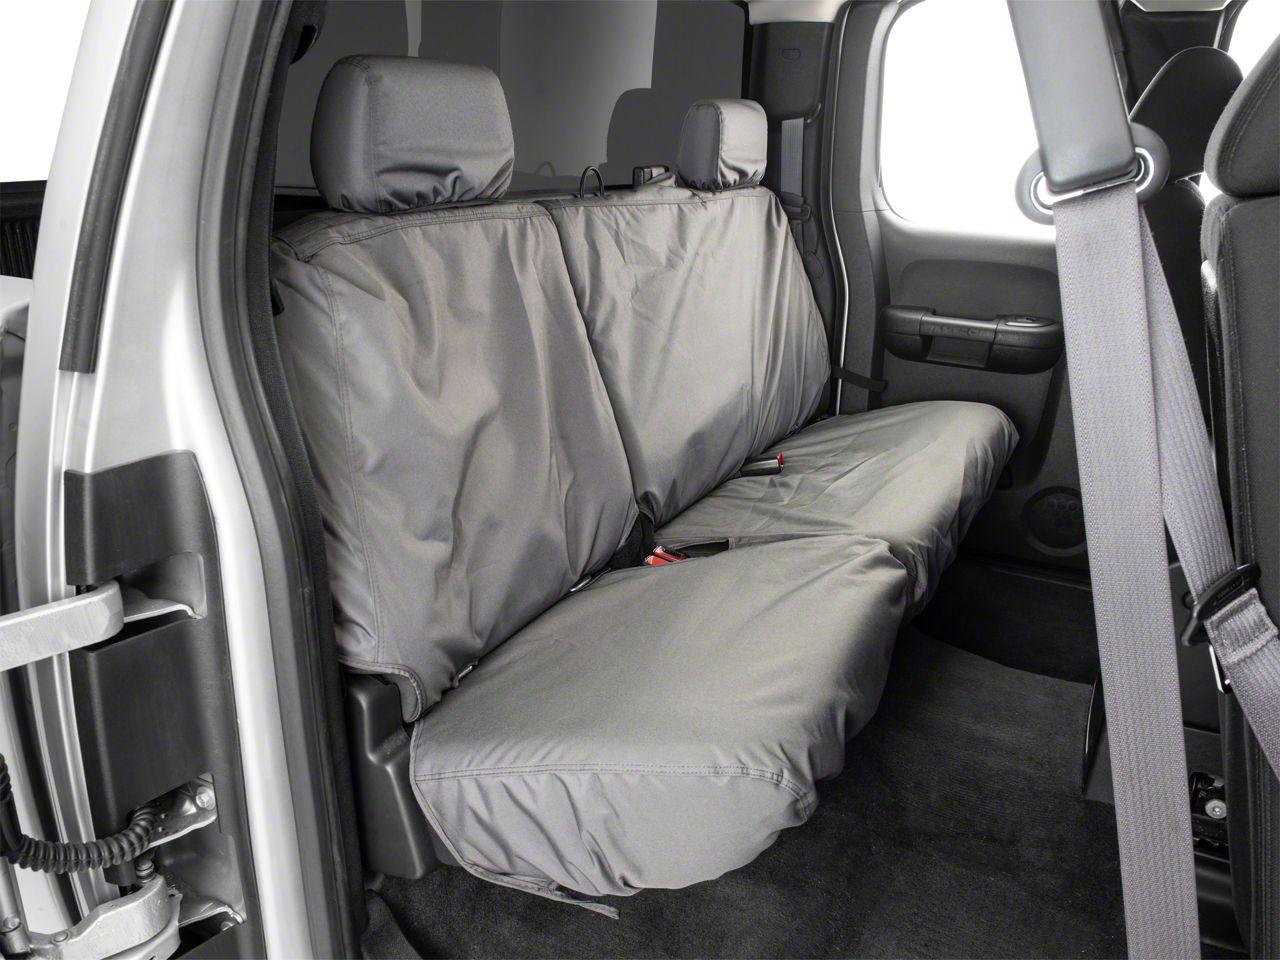 Covercraft SeatSaver Waterproof Second Row Seat Cover - Gray (07-13 Silverado 1500 Extended Cab, Crew Cab)